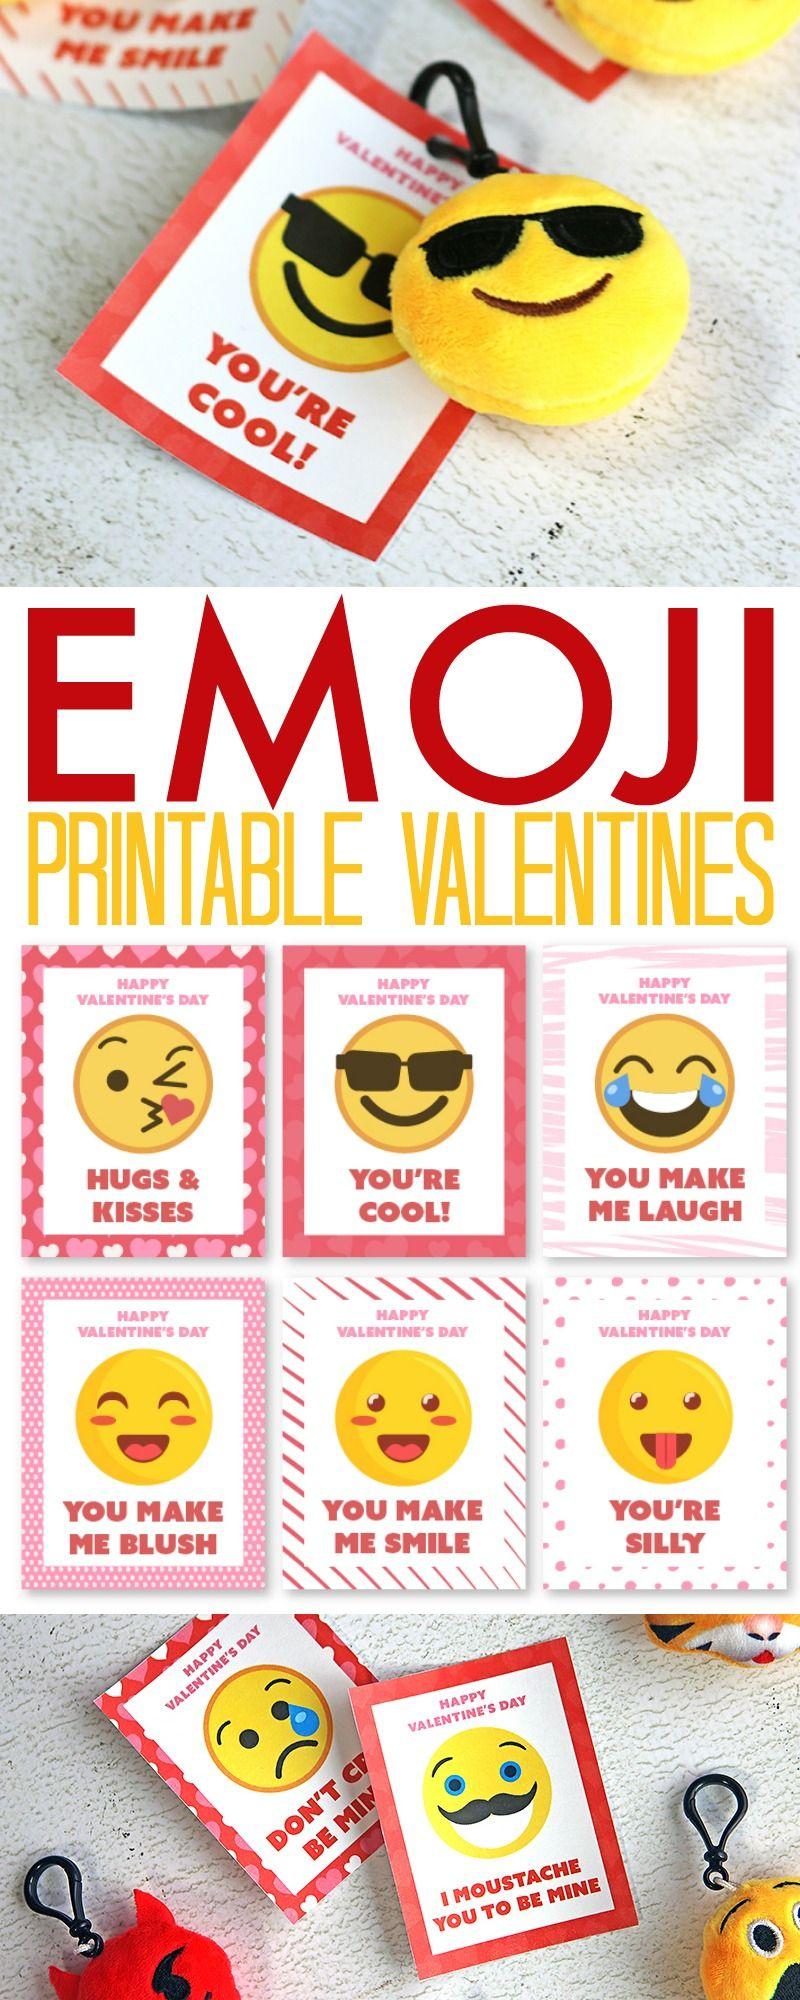 Emoji Printable Valentine S Day Cards Valentine S Day Pinterest